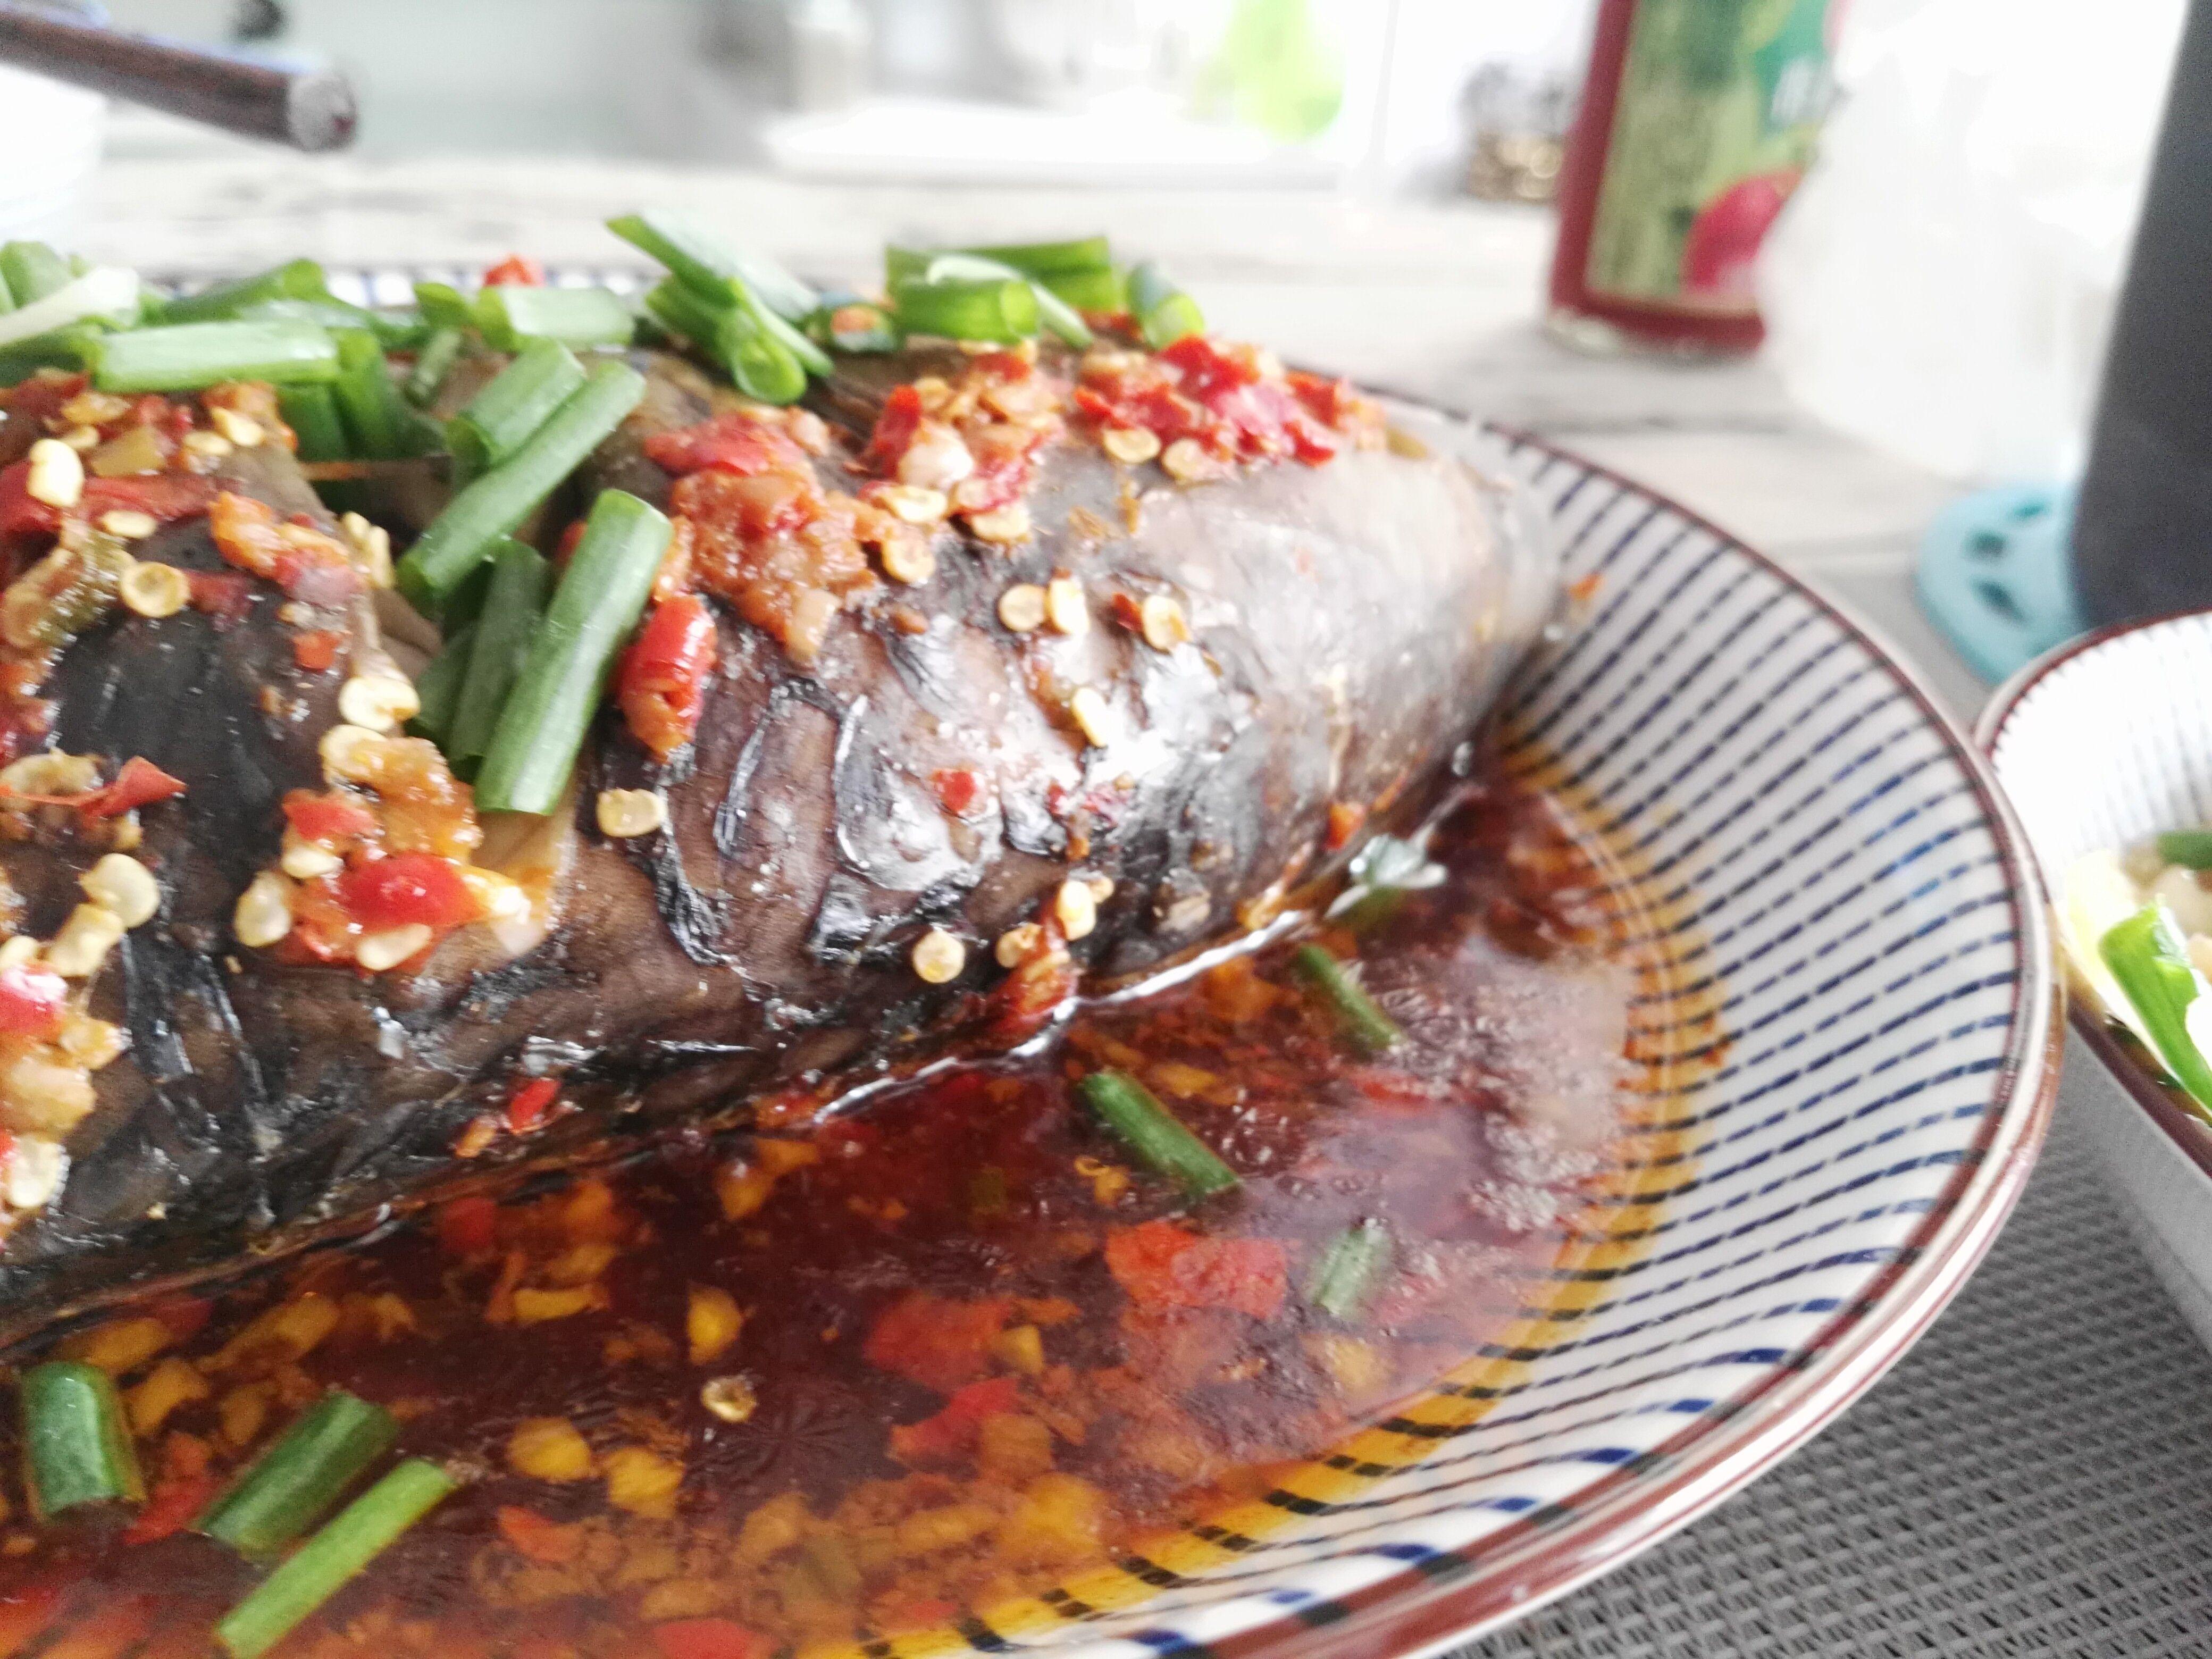 Lijiang girl cooked delicacy lijiang snacks lijiang gourmet for Fish and grill